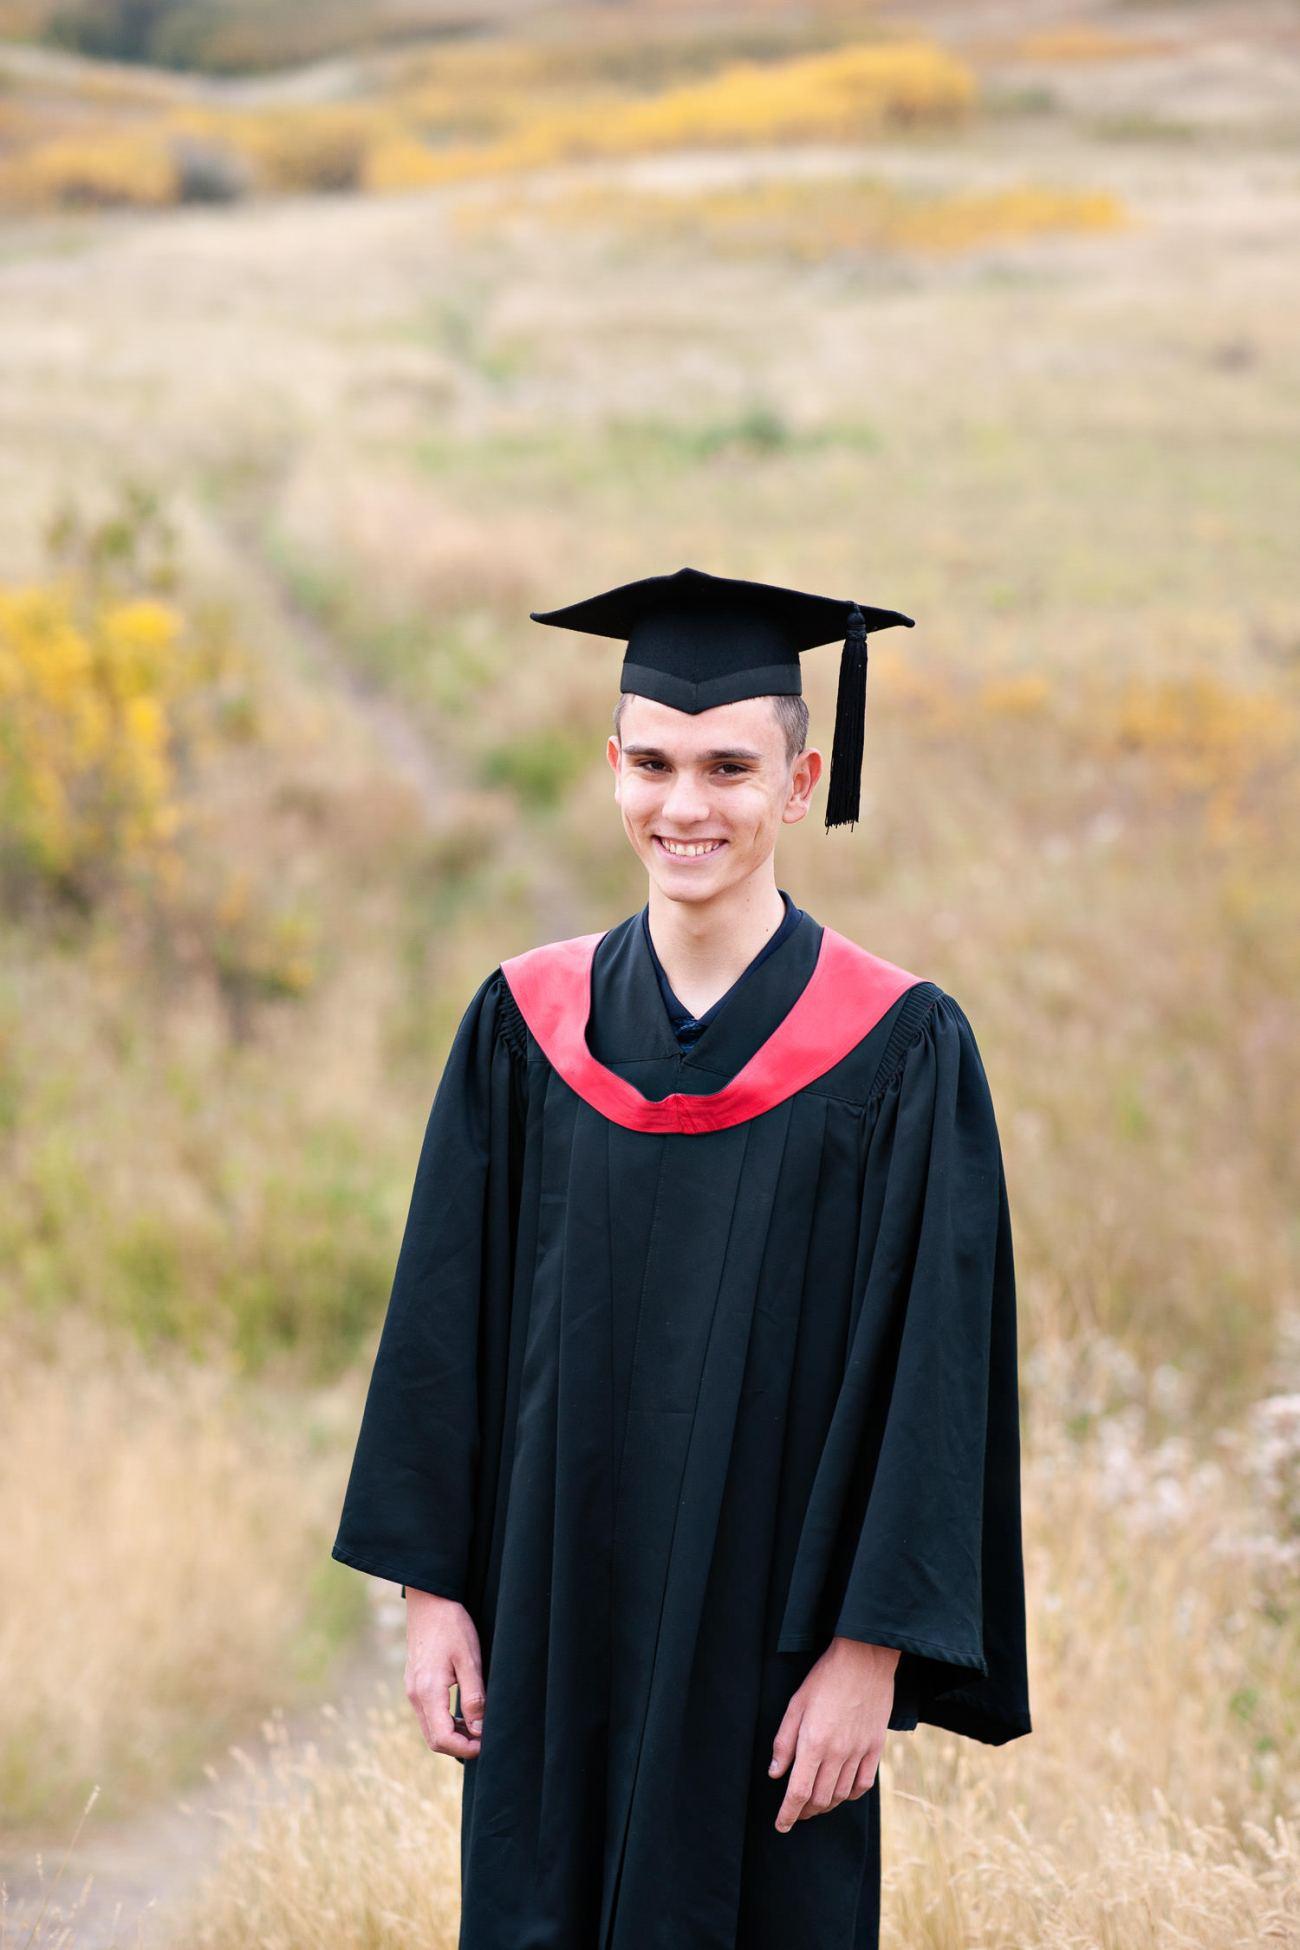 Calgary grad in cap and gown captured by Calgary photographer Tara Whittaker